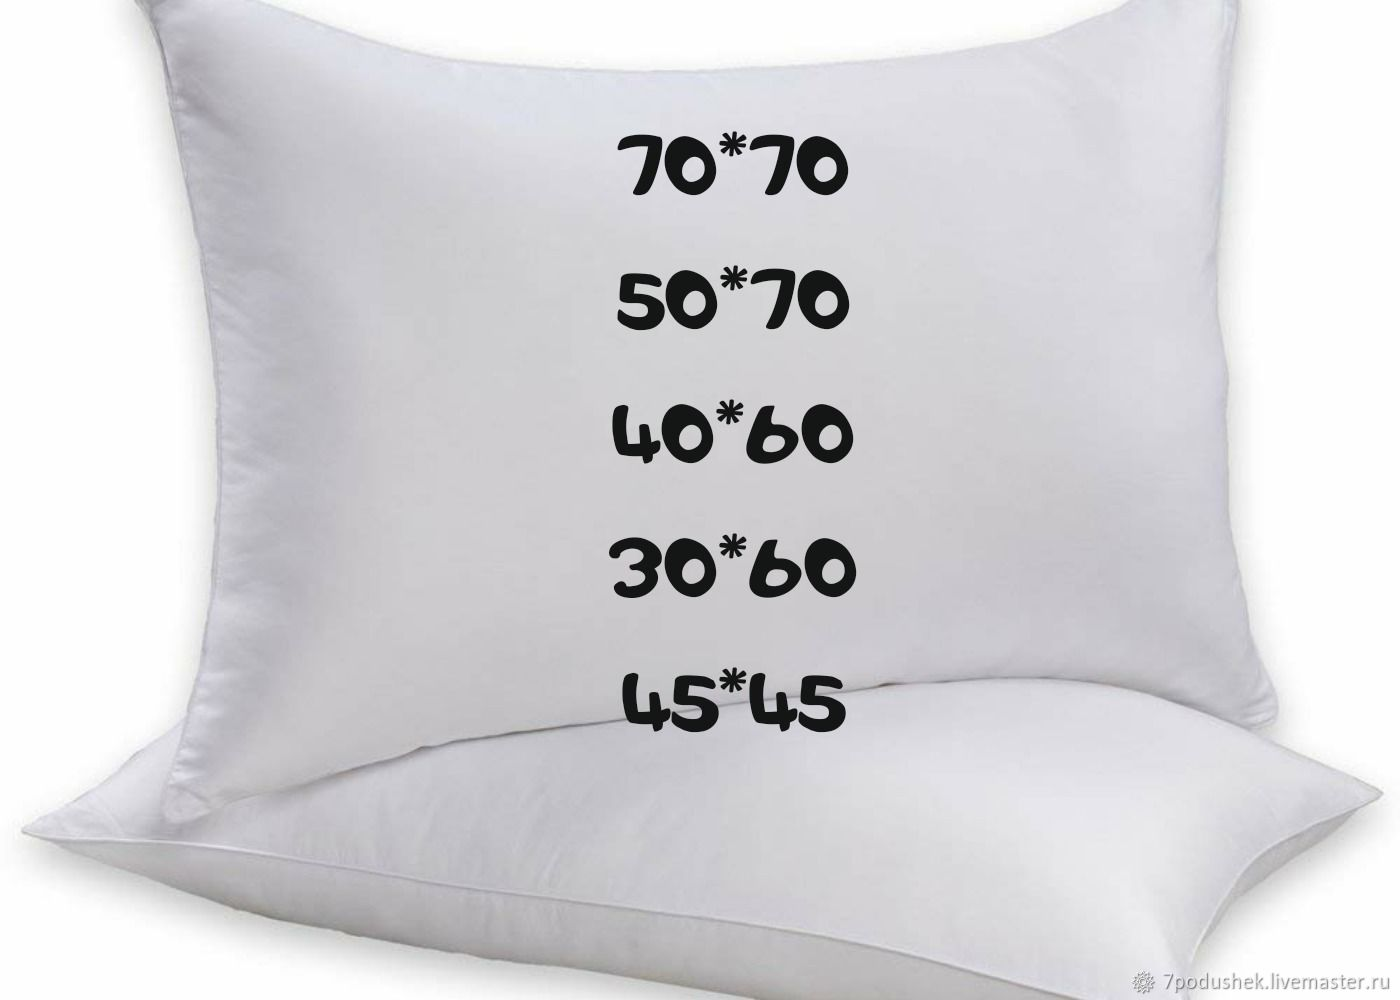 Белая подушка для сна любого размера 100%хлопок, Подушки, Москва,  Фото №1